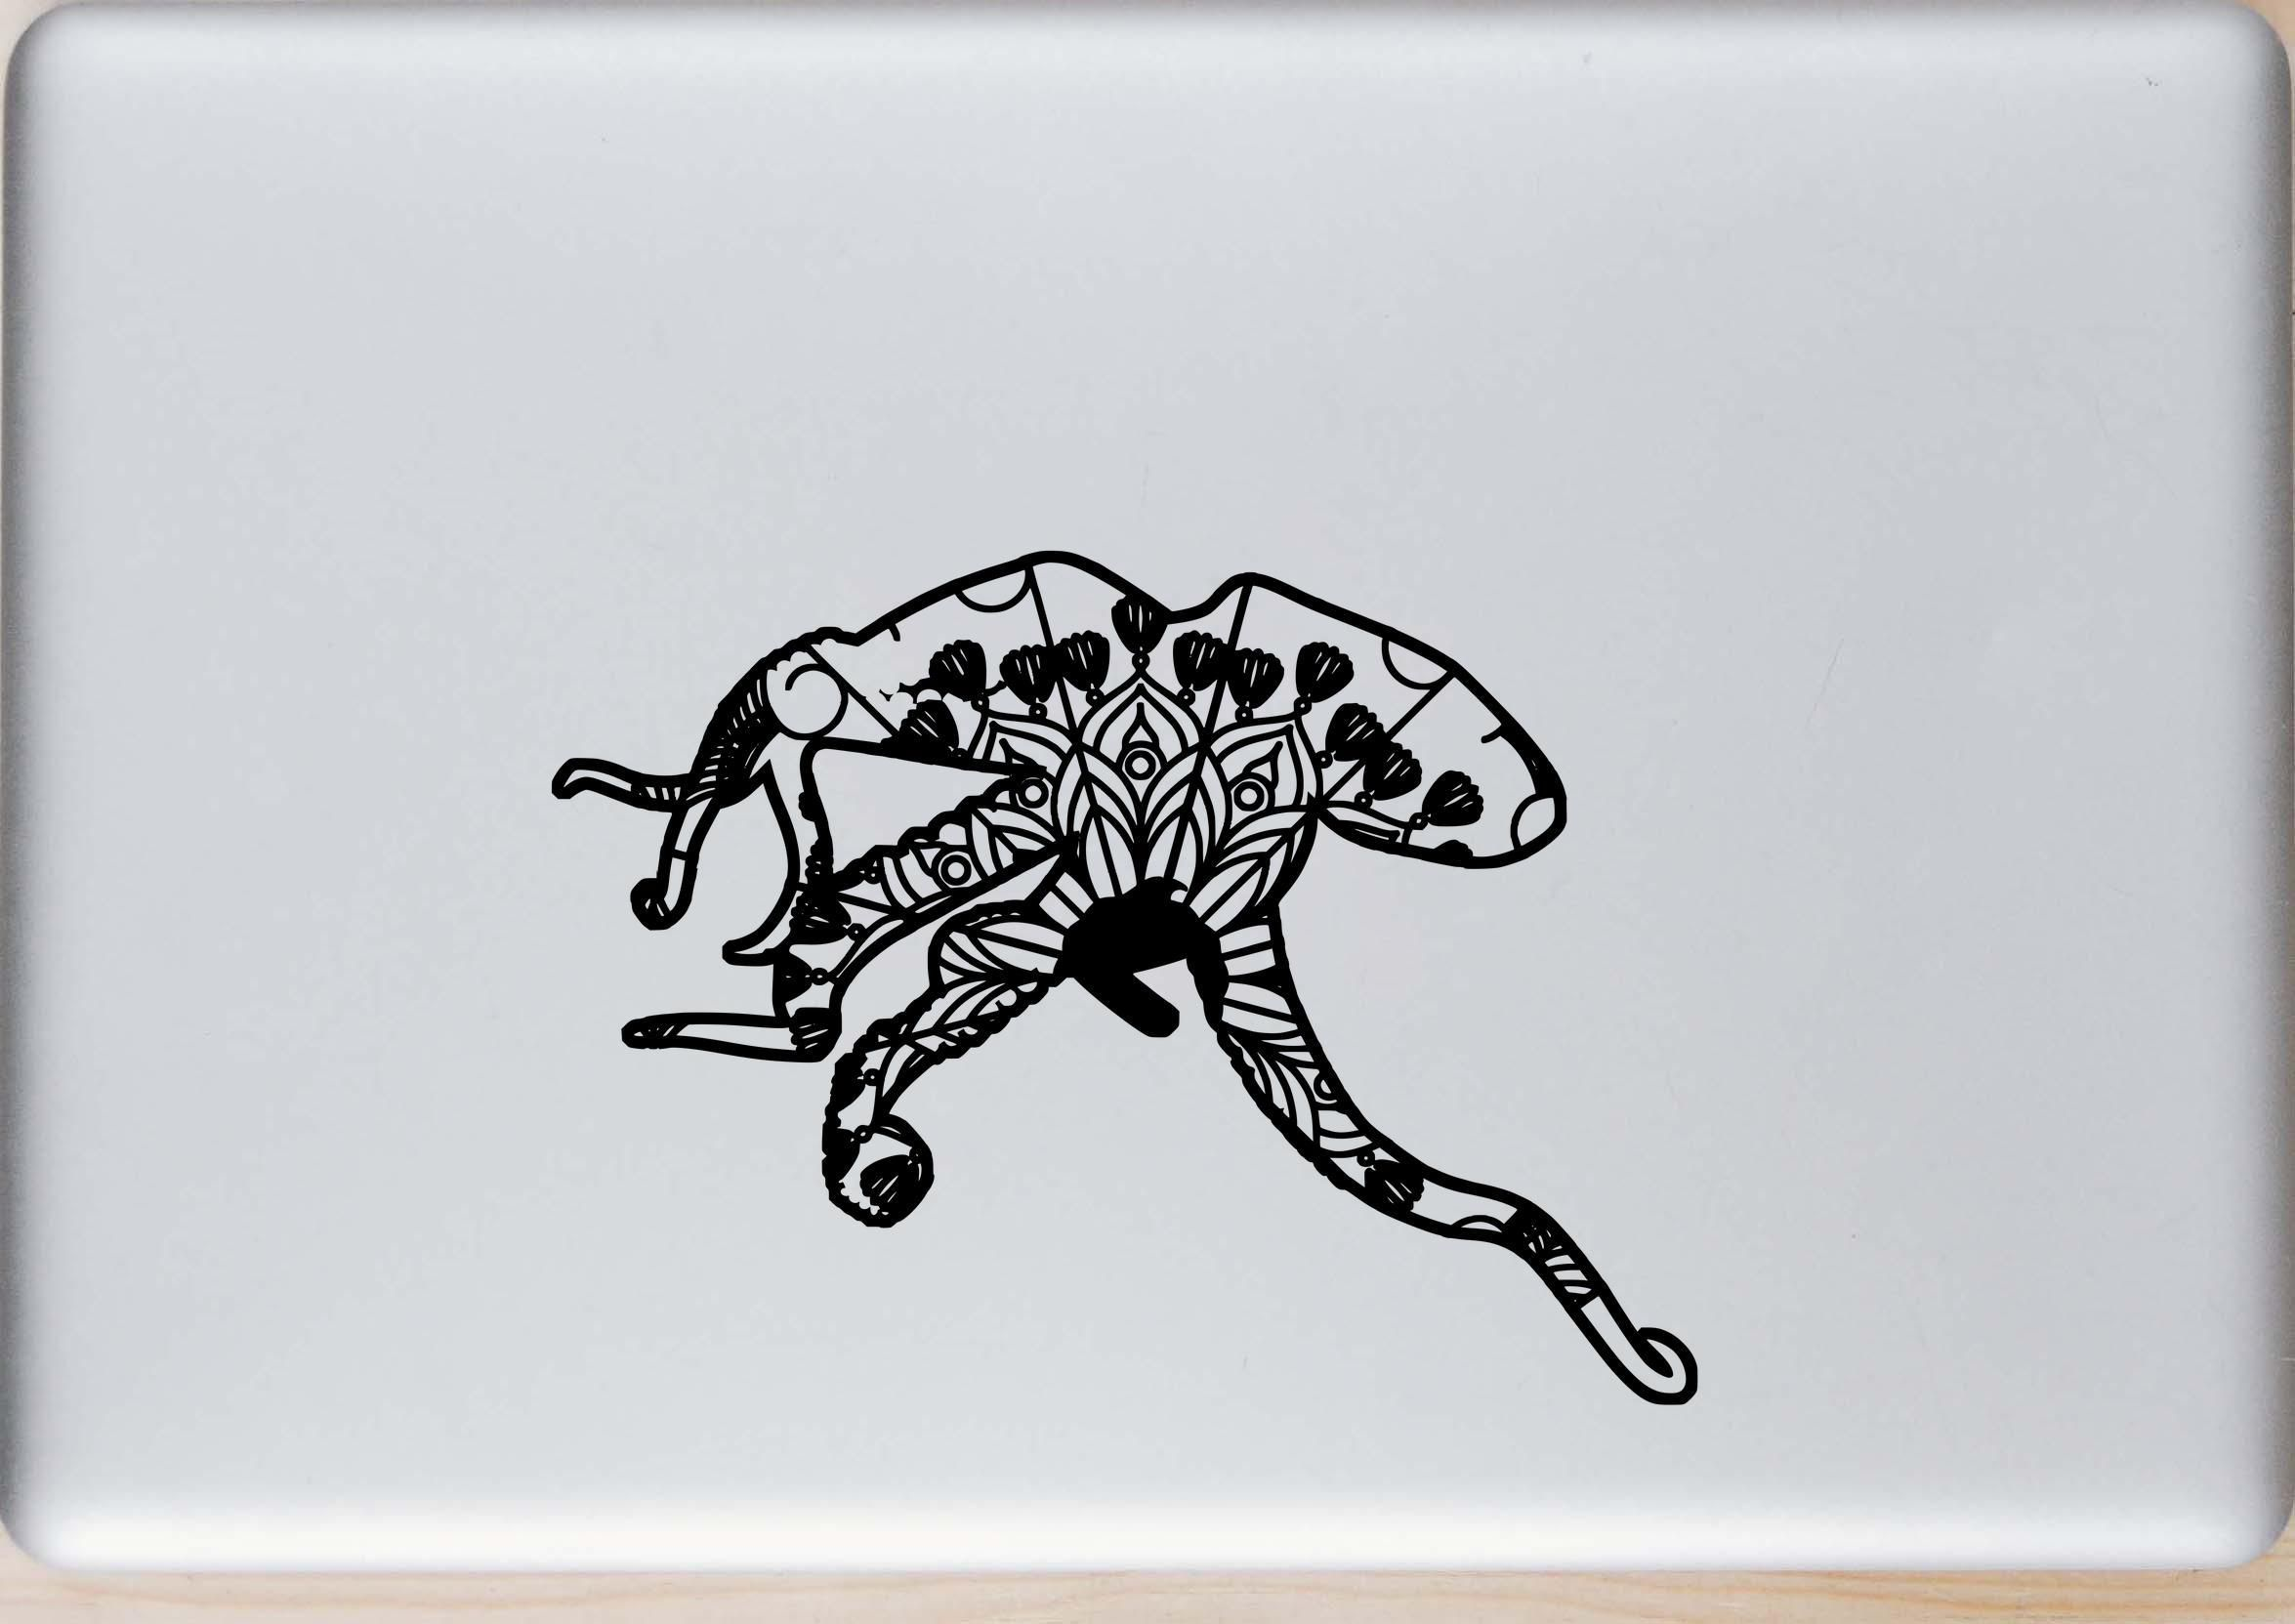 Download Octopus Mandala Animal Svg T-Shirt Designs | Tshirt ...